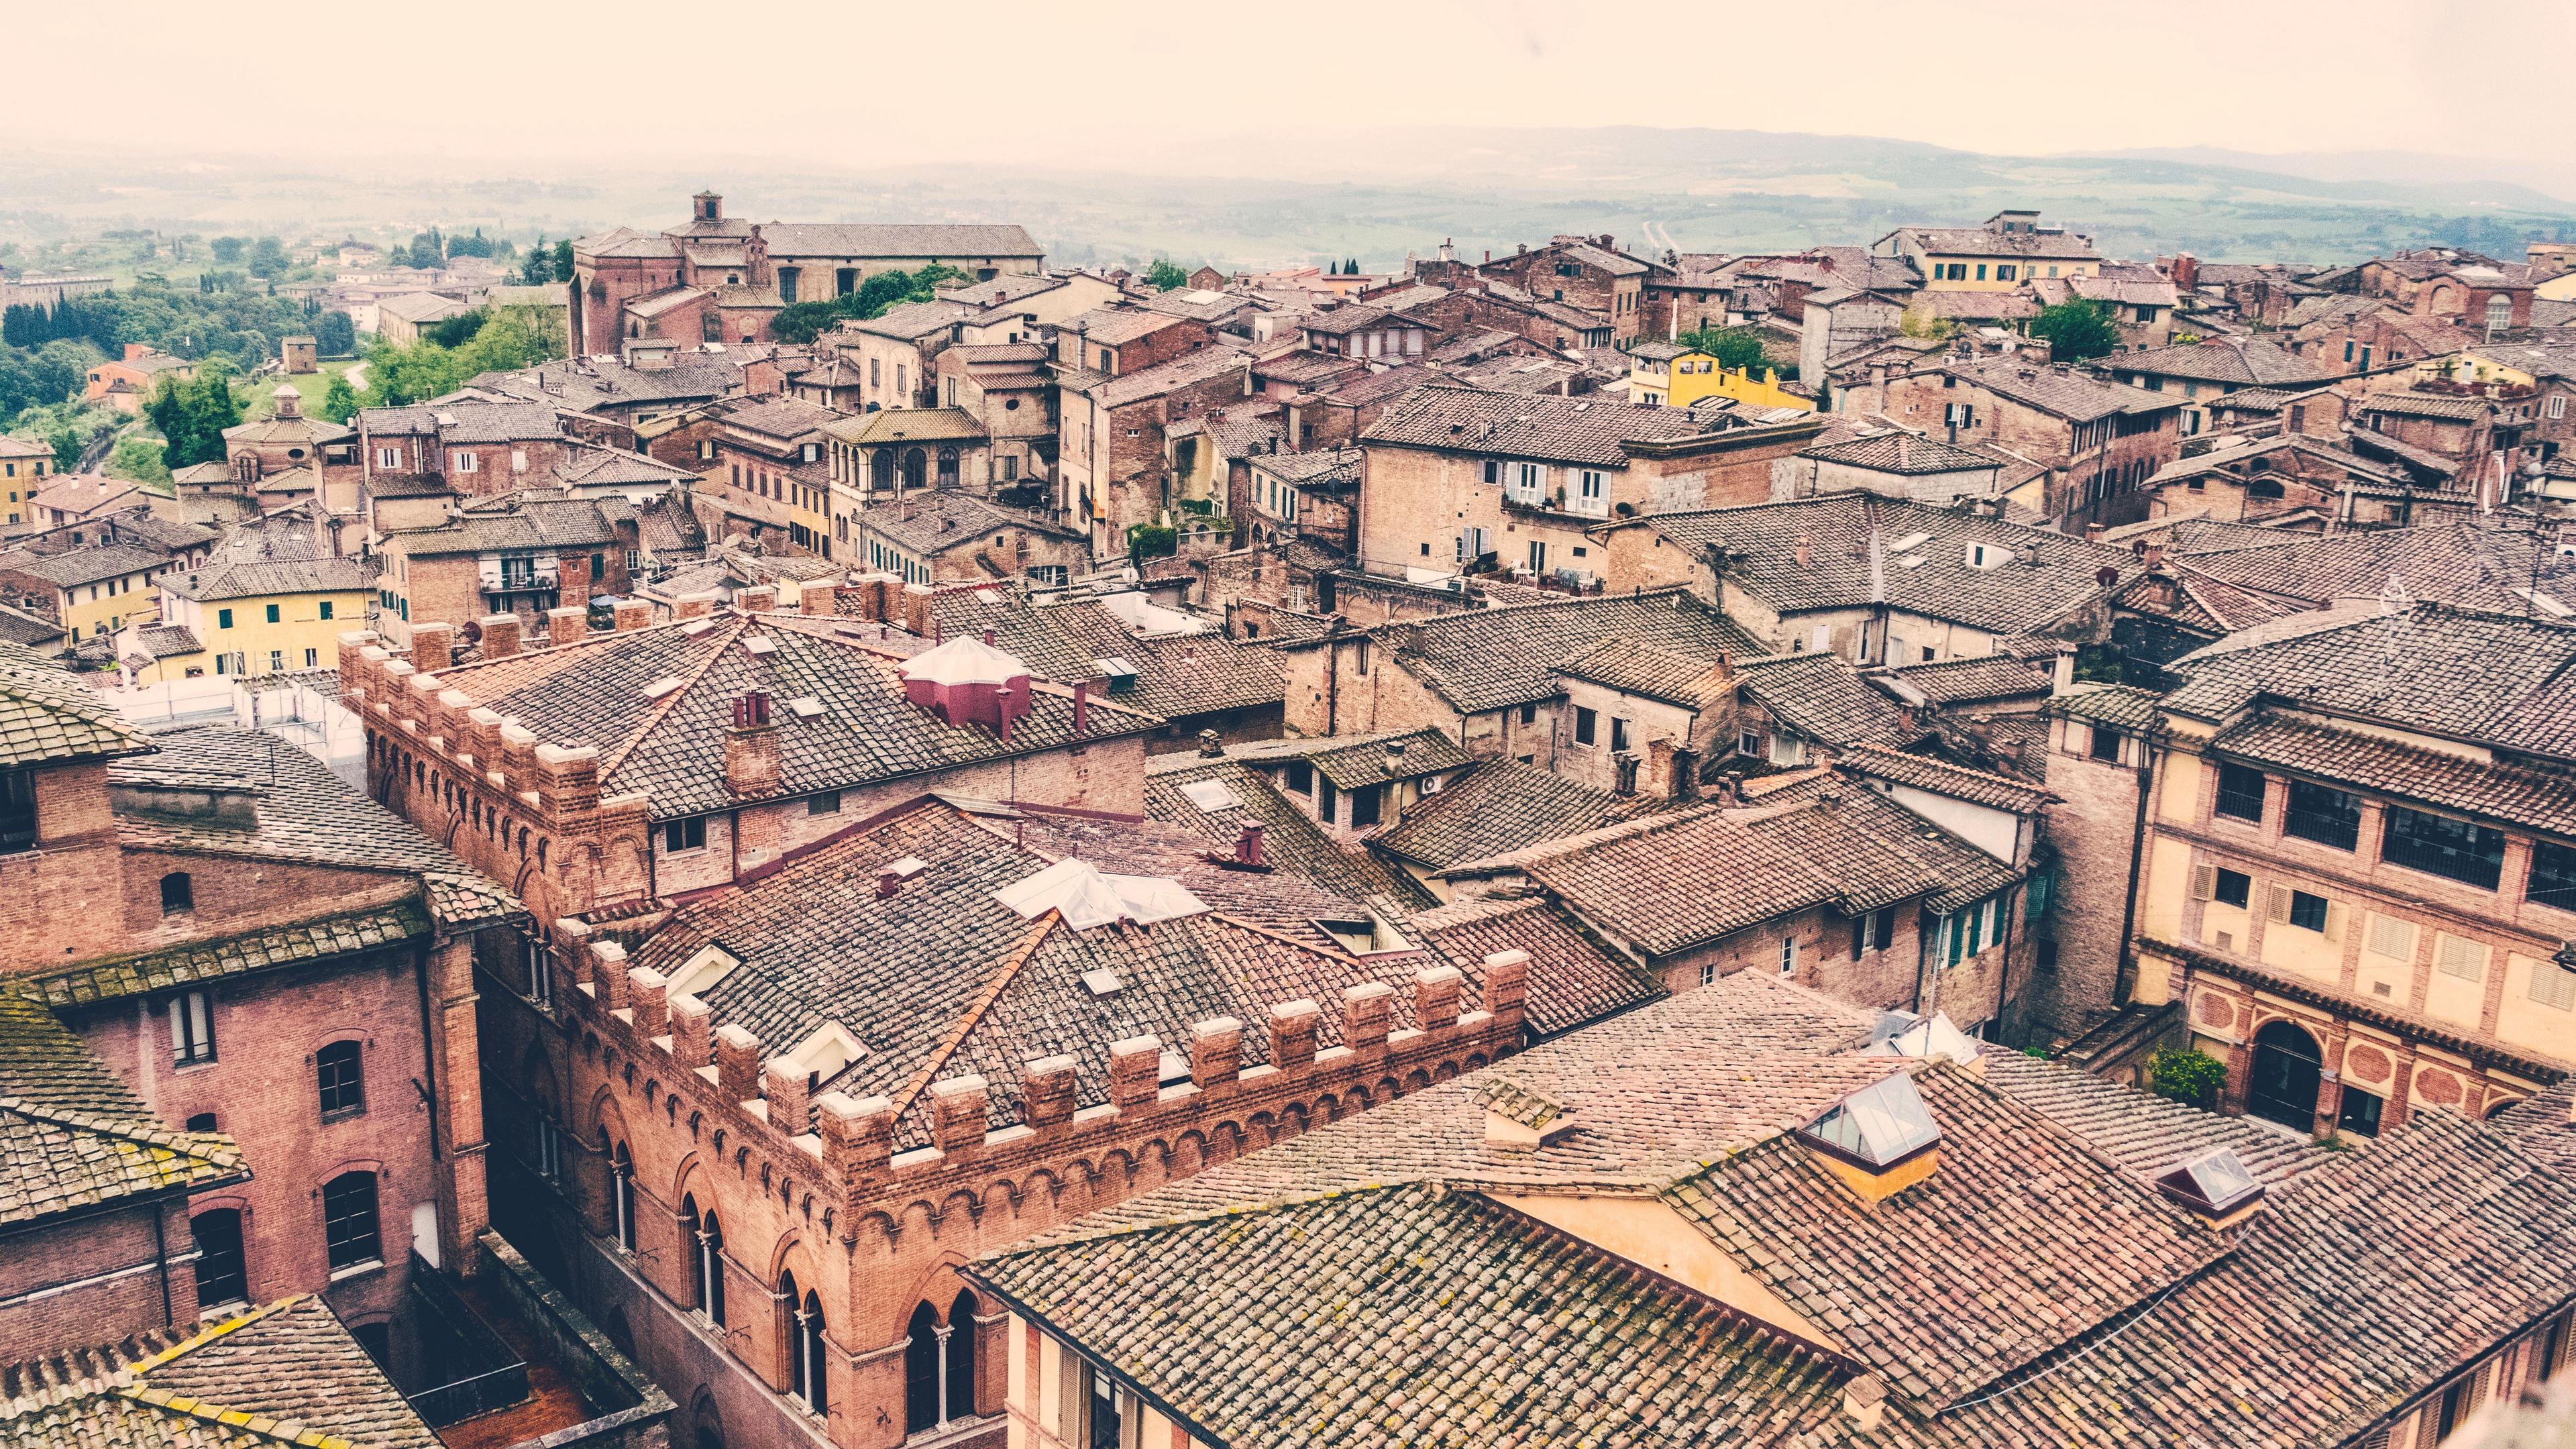 roof city architecture 4k 1538065651 - roof, city, architecture 4k - roof, City, Architecture